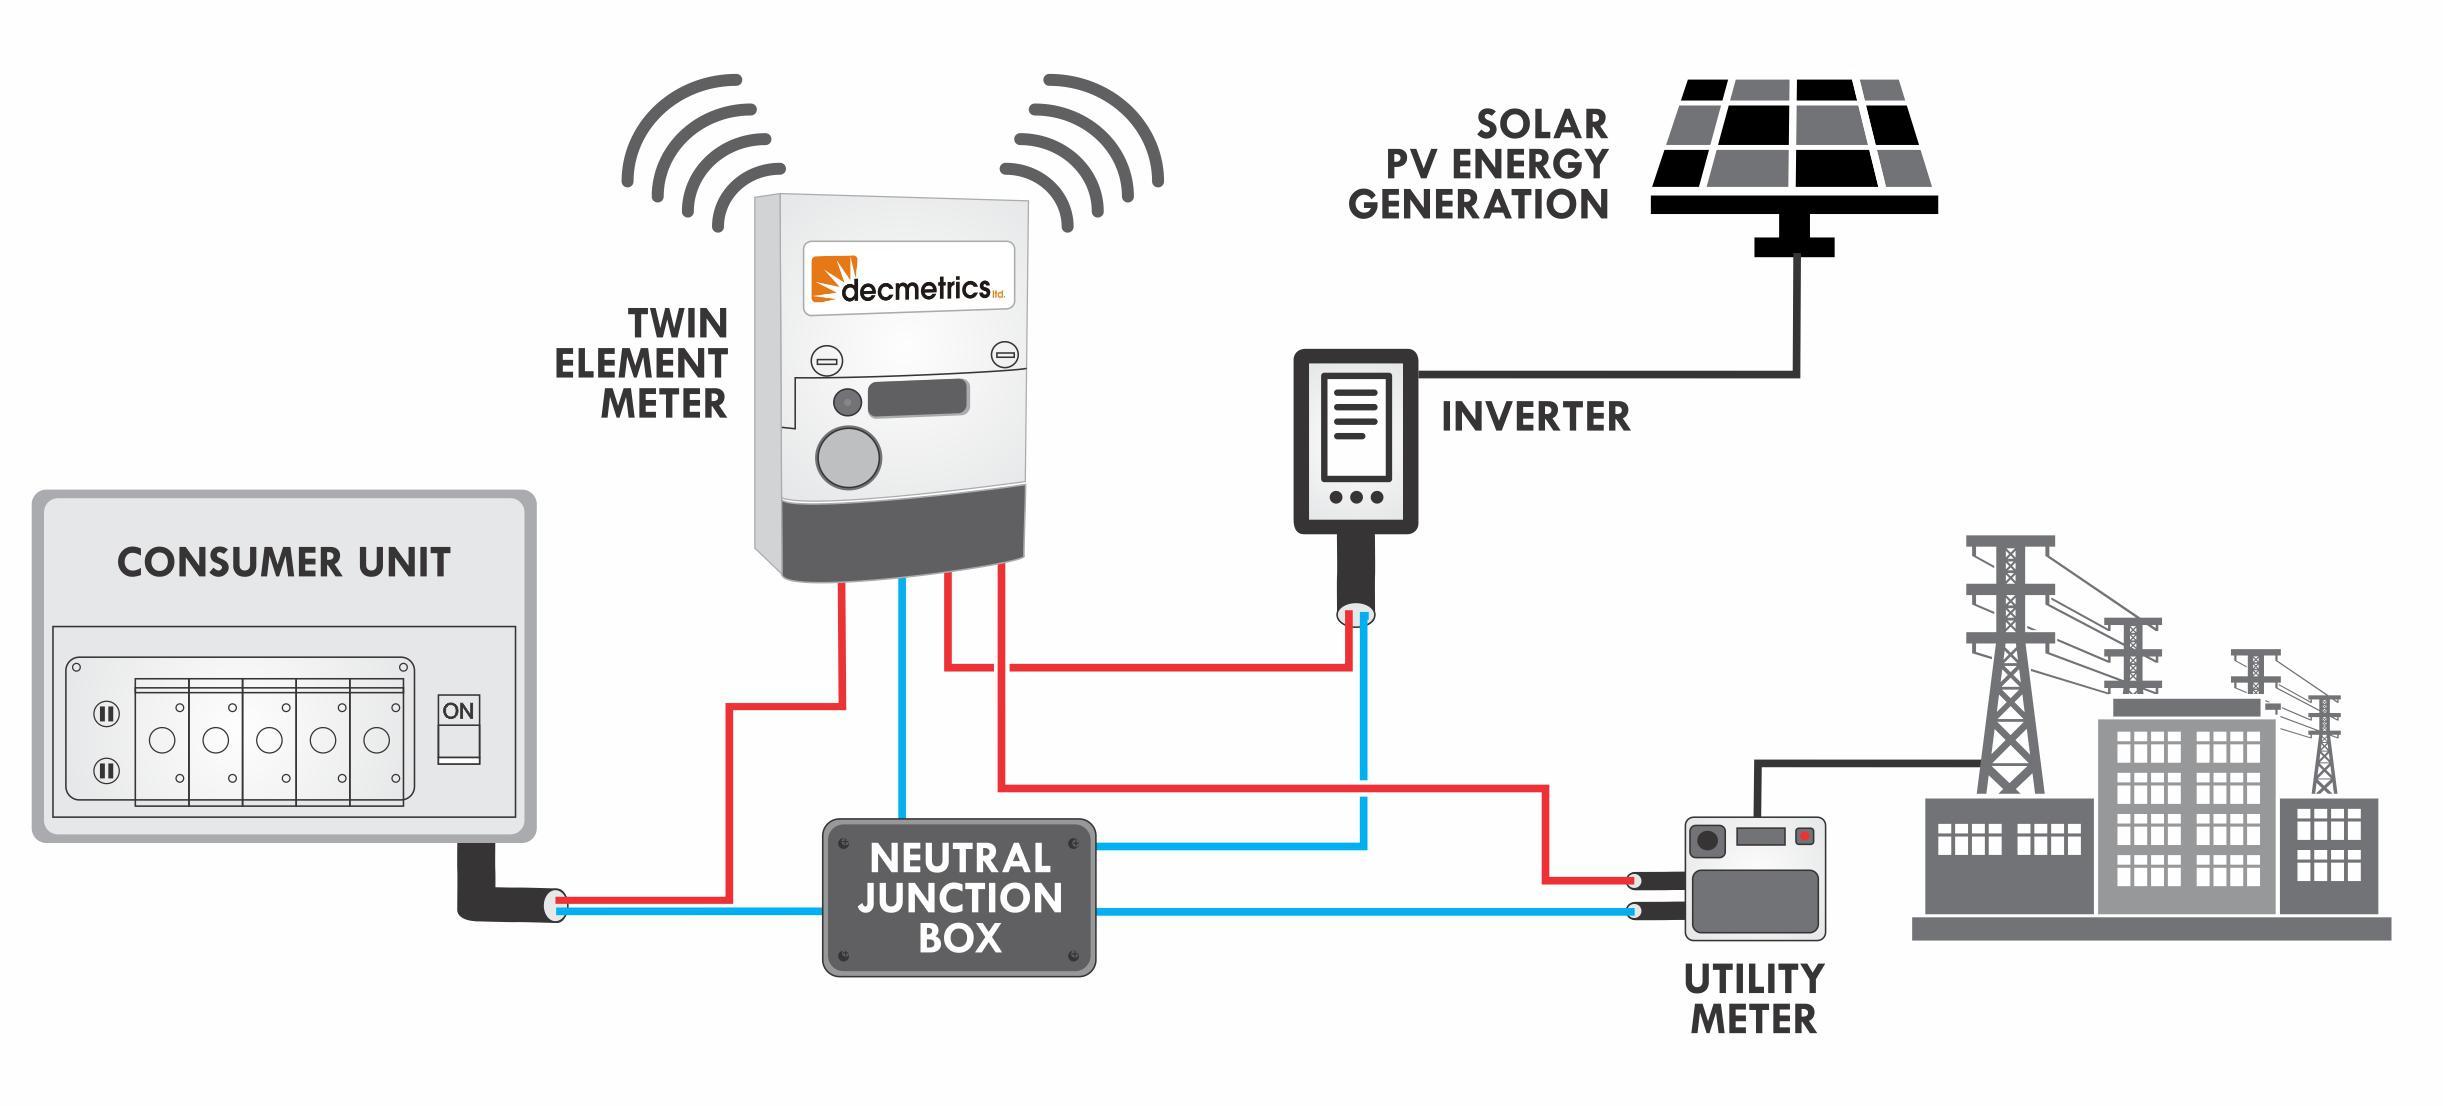 small resolution of solar pv solar pv net metering schematic diagram solar net metering wiring diagram solar metering wiring